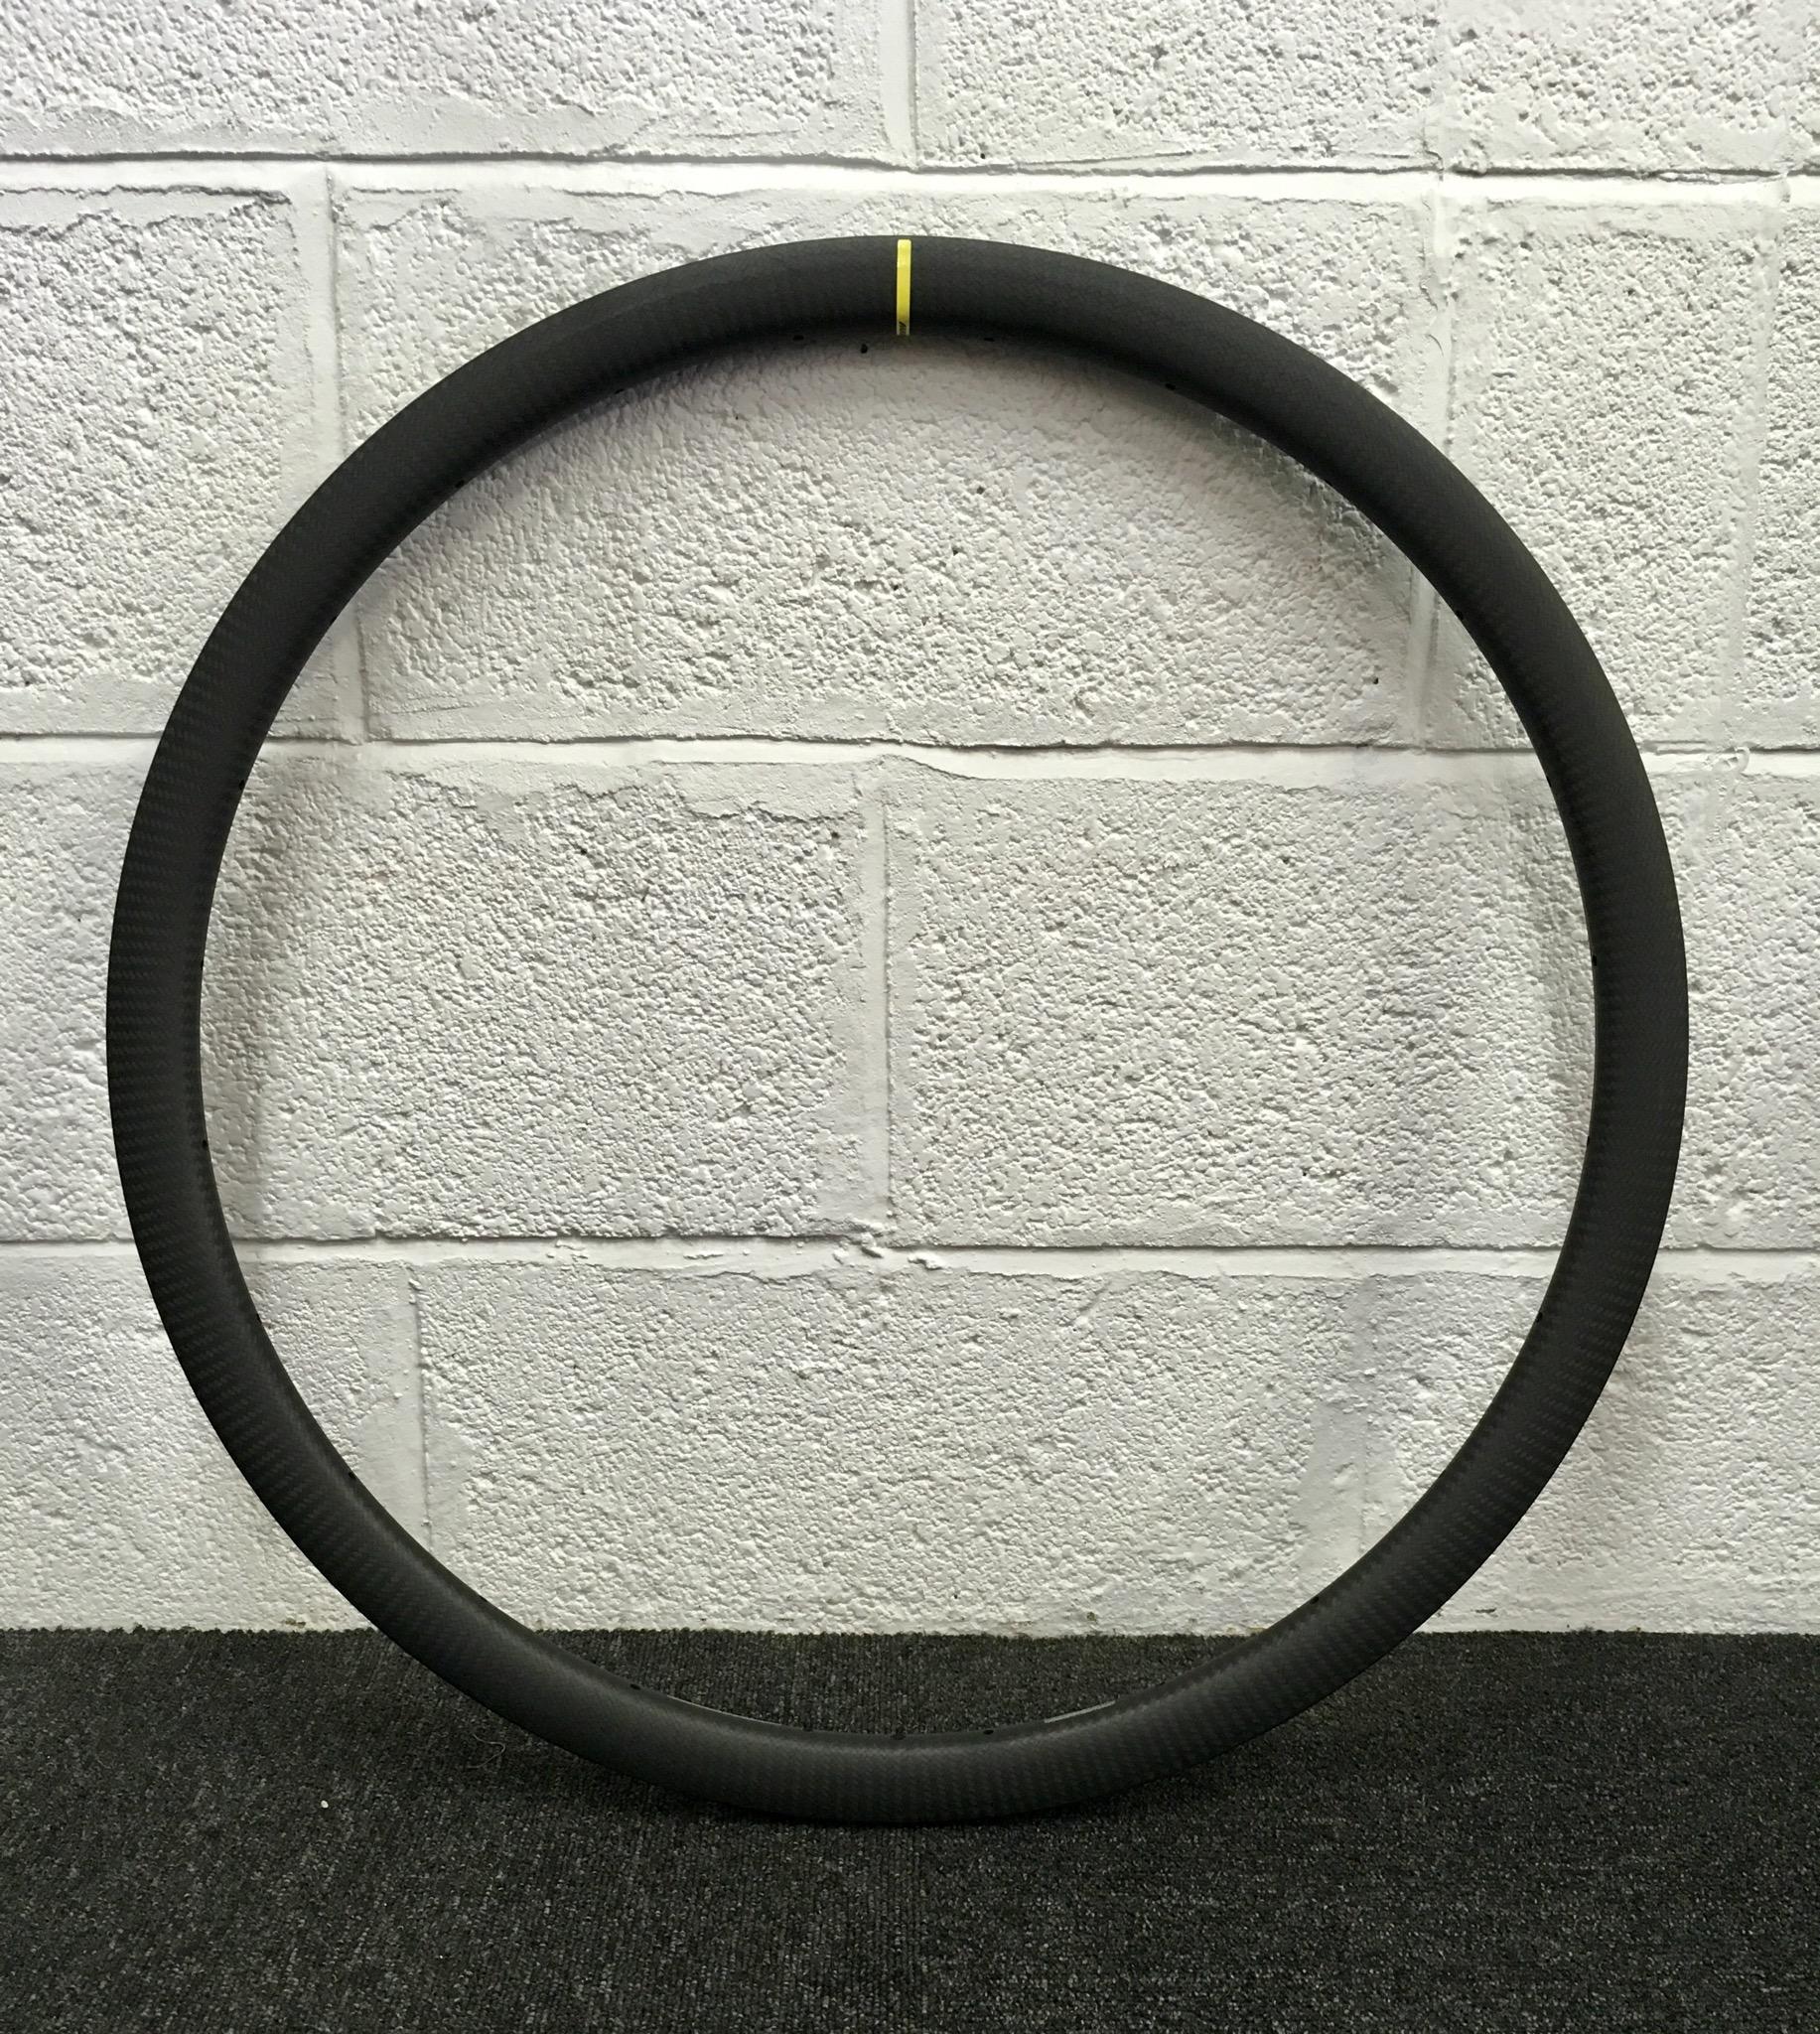 Mavic Open PRO Carbon disc rim (as used on the Ksyrium Carbon disc pro sl)  Rim weight 390g  Rim height 32mm  Cost £545 each rim